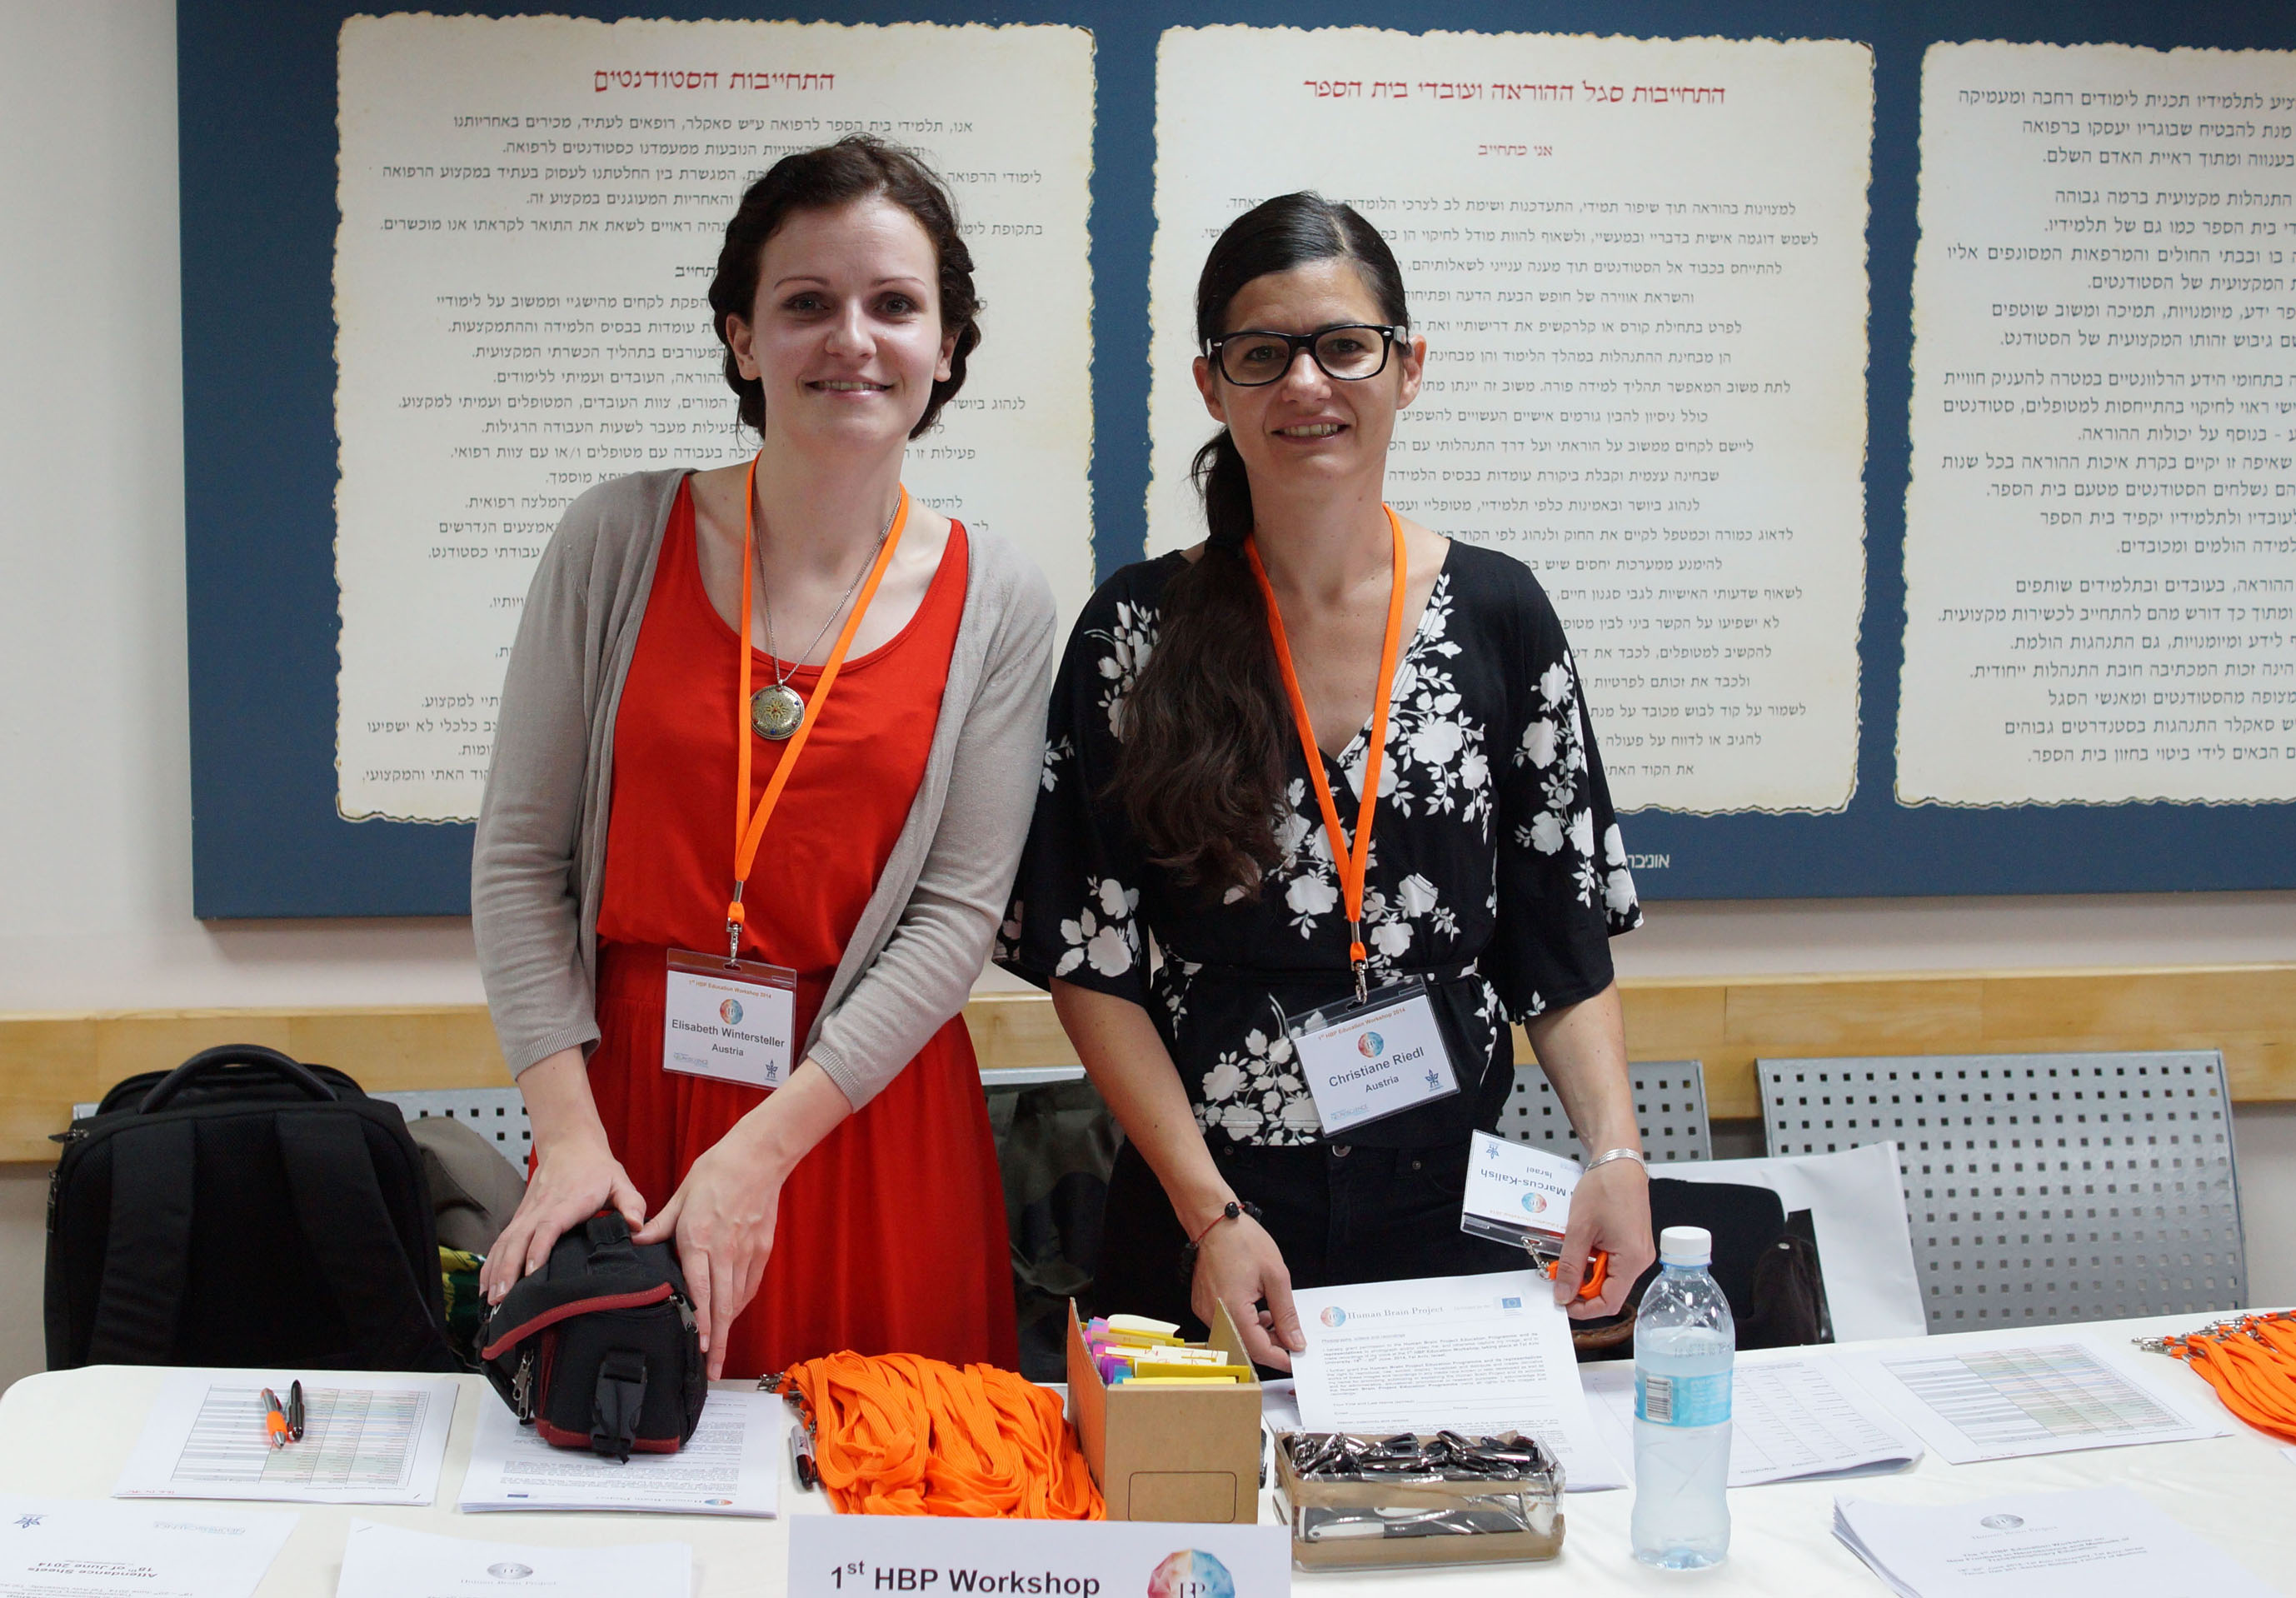 HBP Education Programme Office - Christiane Riedl + Elisabeth Wintersteller -